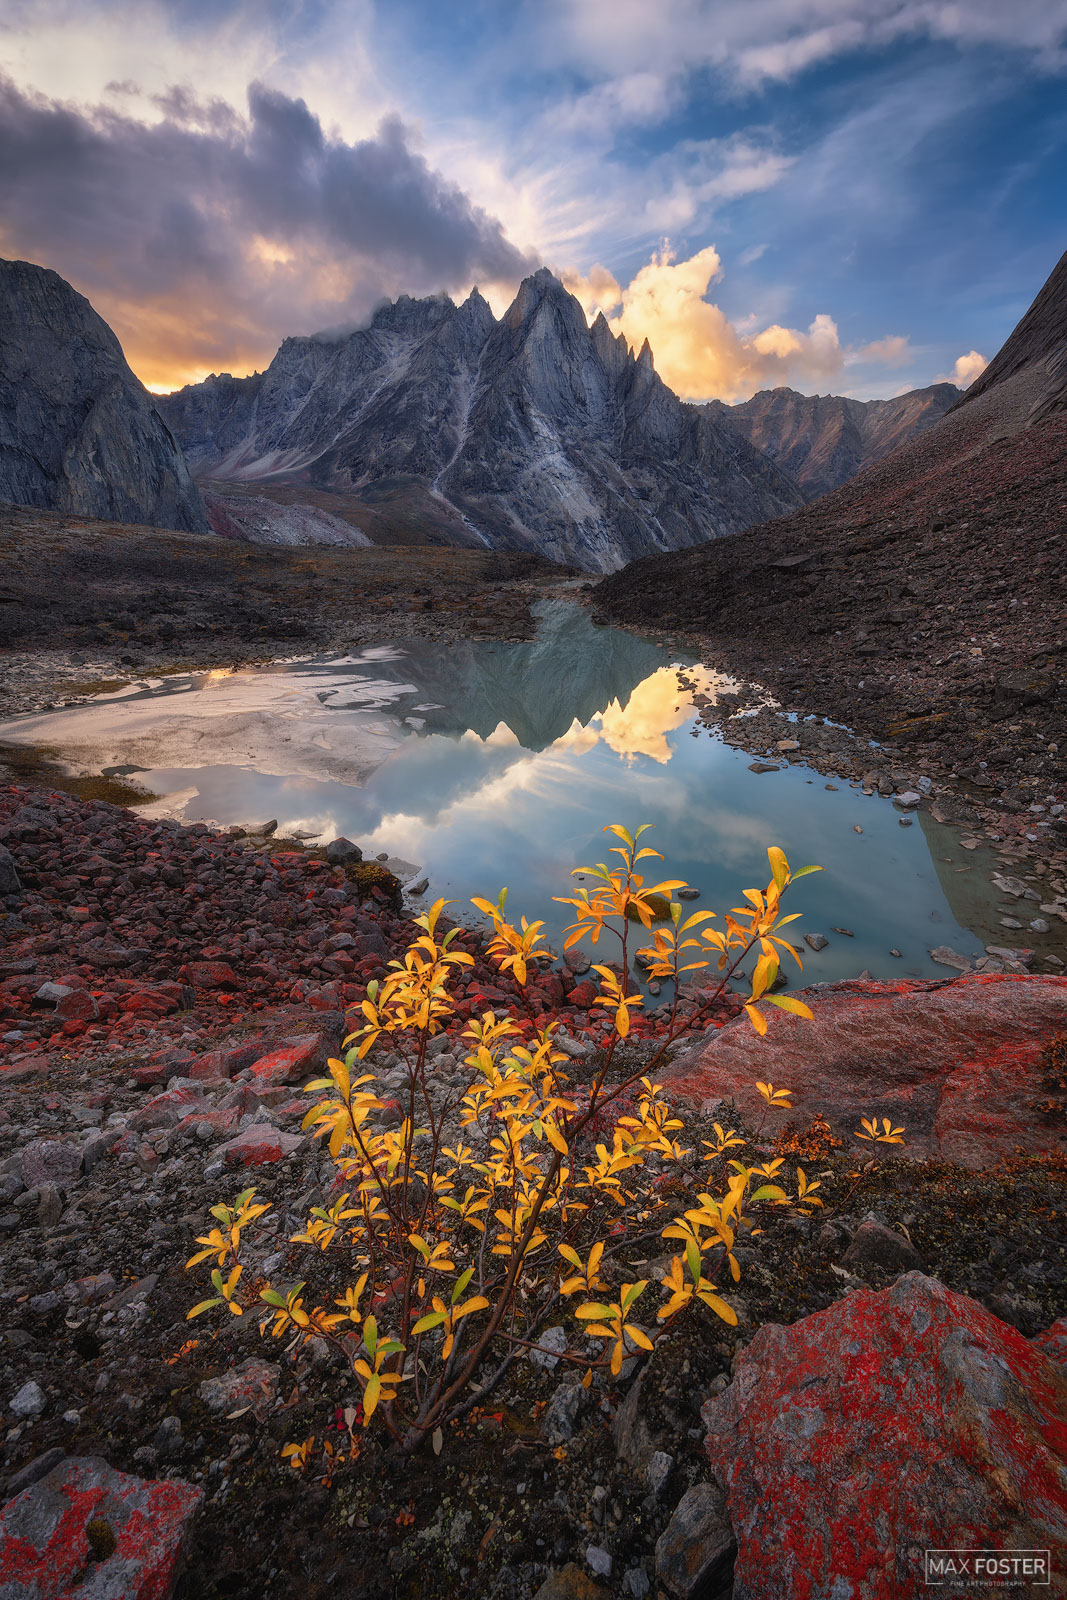 Arrigetch Peaks Wilderness, Gates of the Arctic National Park, Alaska, Wild Awakening, photo